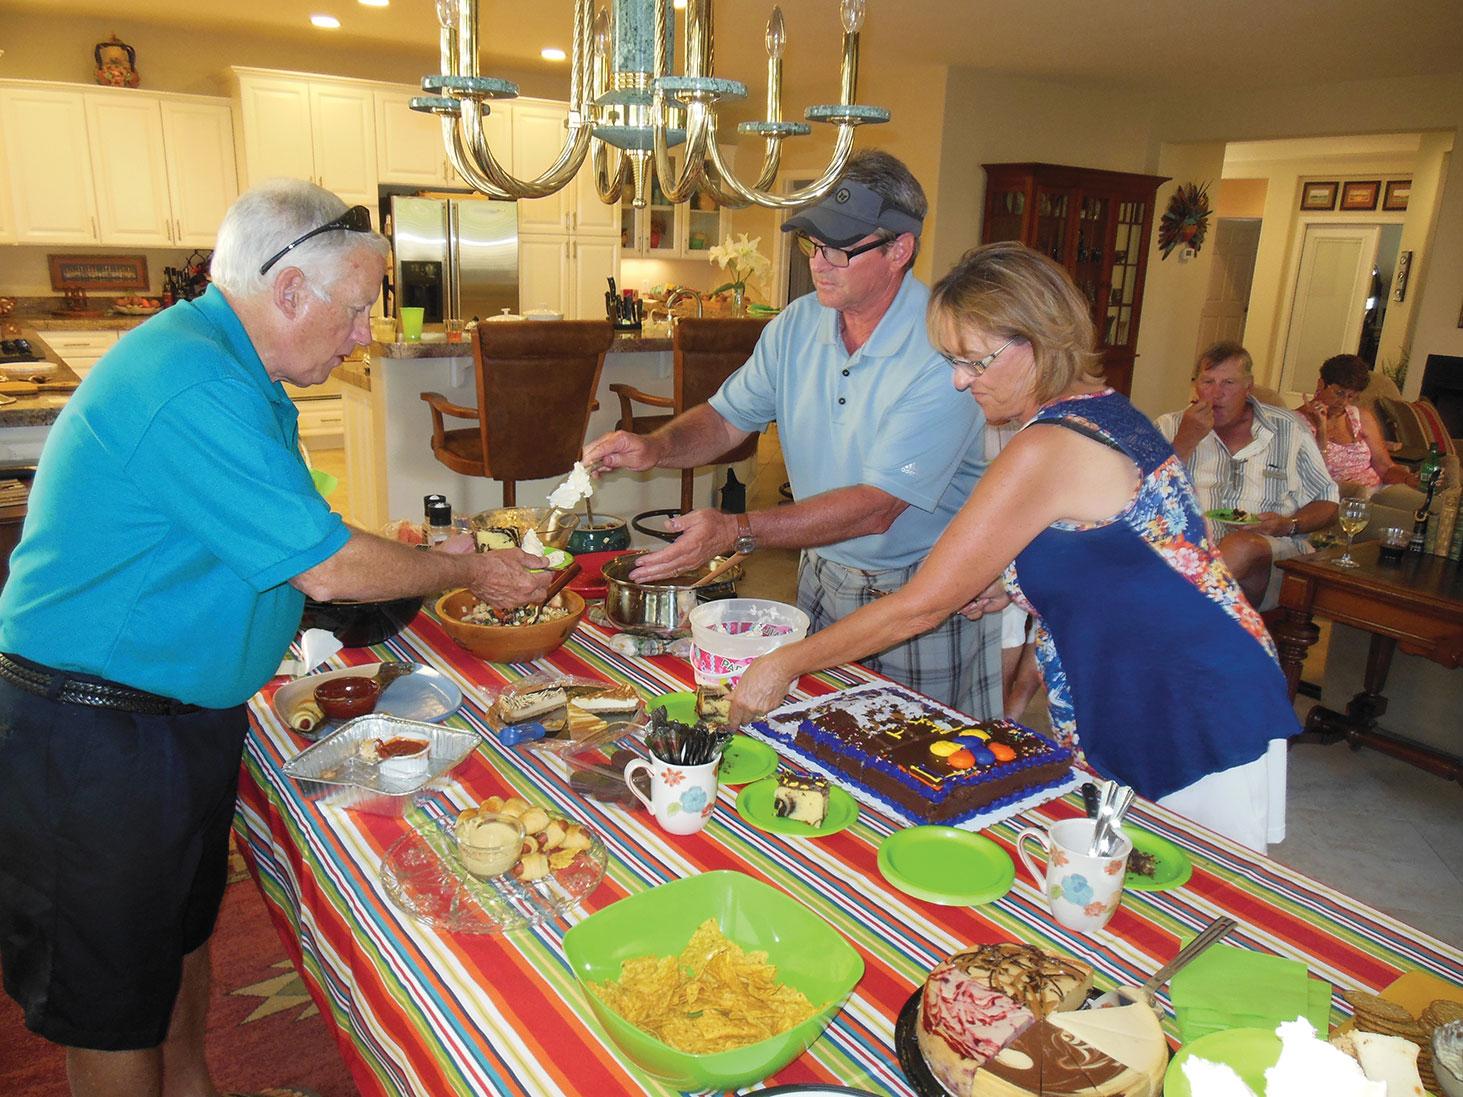 Bob Burton, Jeff and Layne Jones dishing up the cake and ice cream.